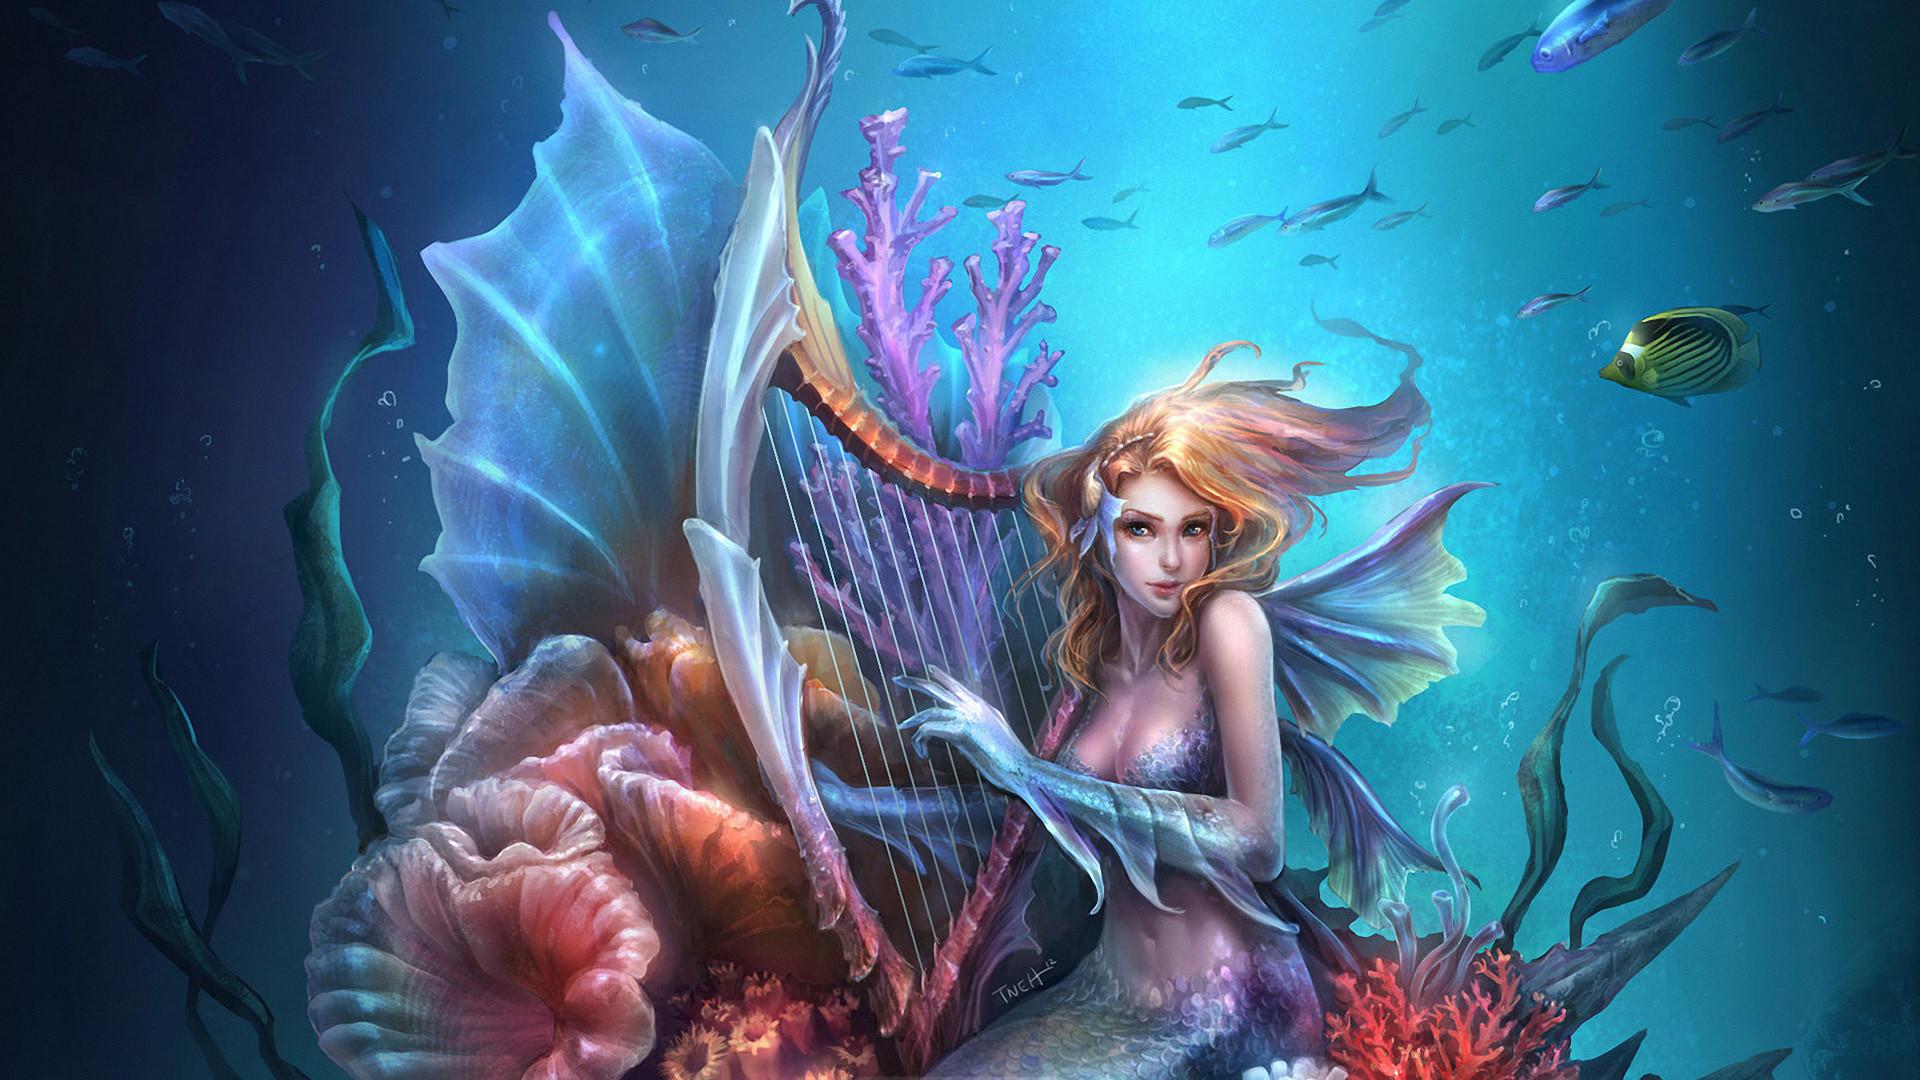 18 HD Mermaid Desktop Wallpapers For Free Download